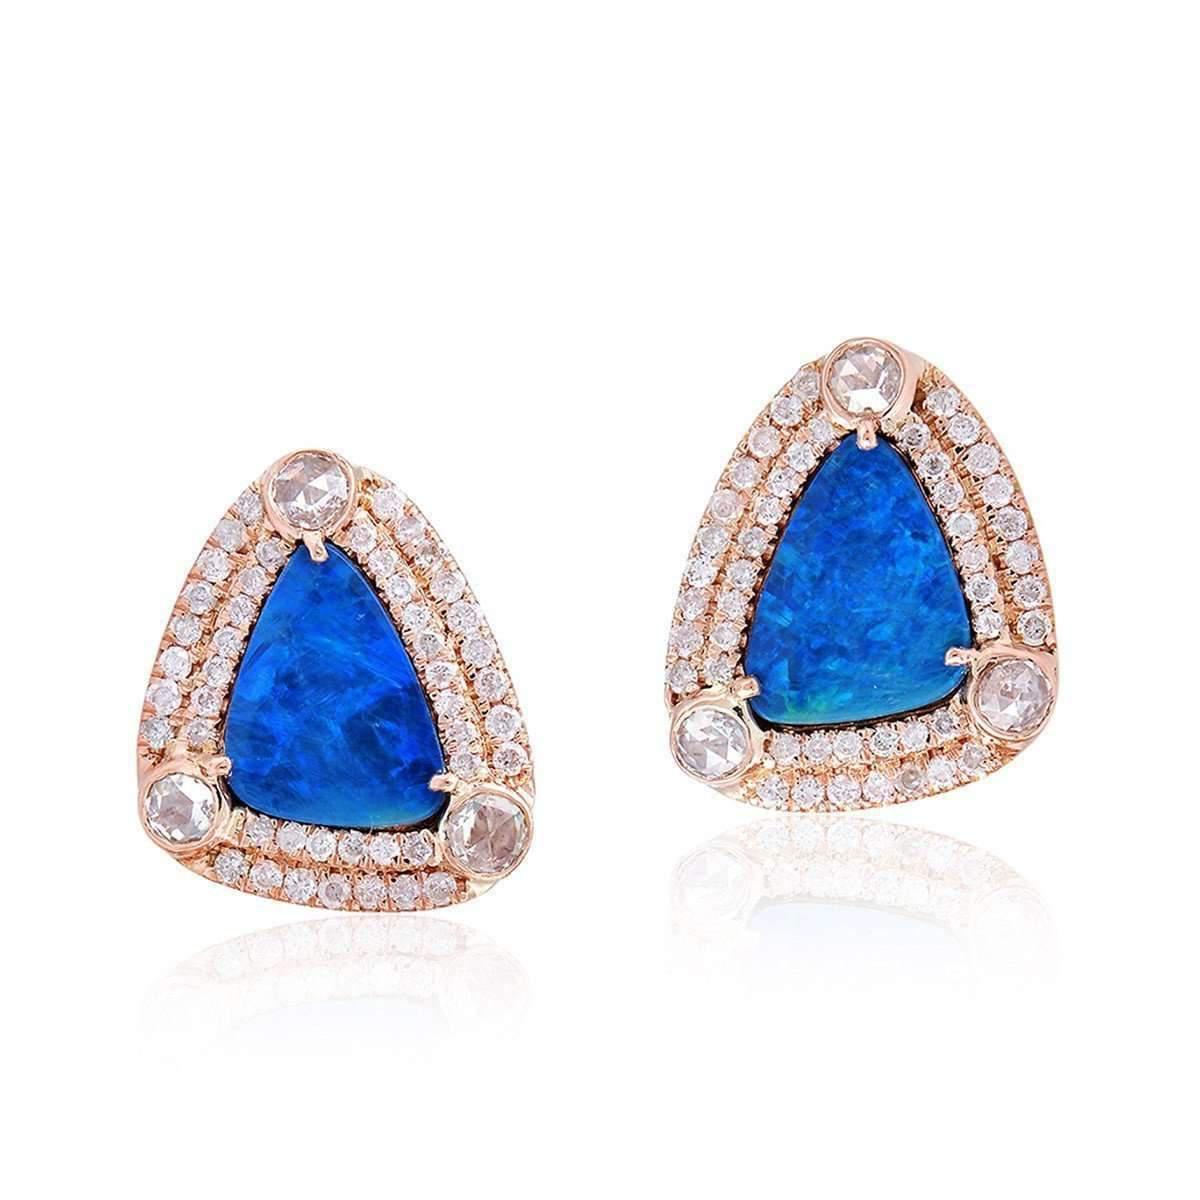 Socheec Blue Opal Stud Earring nvEj47uVX